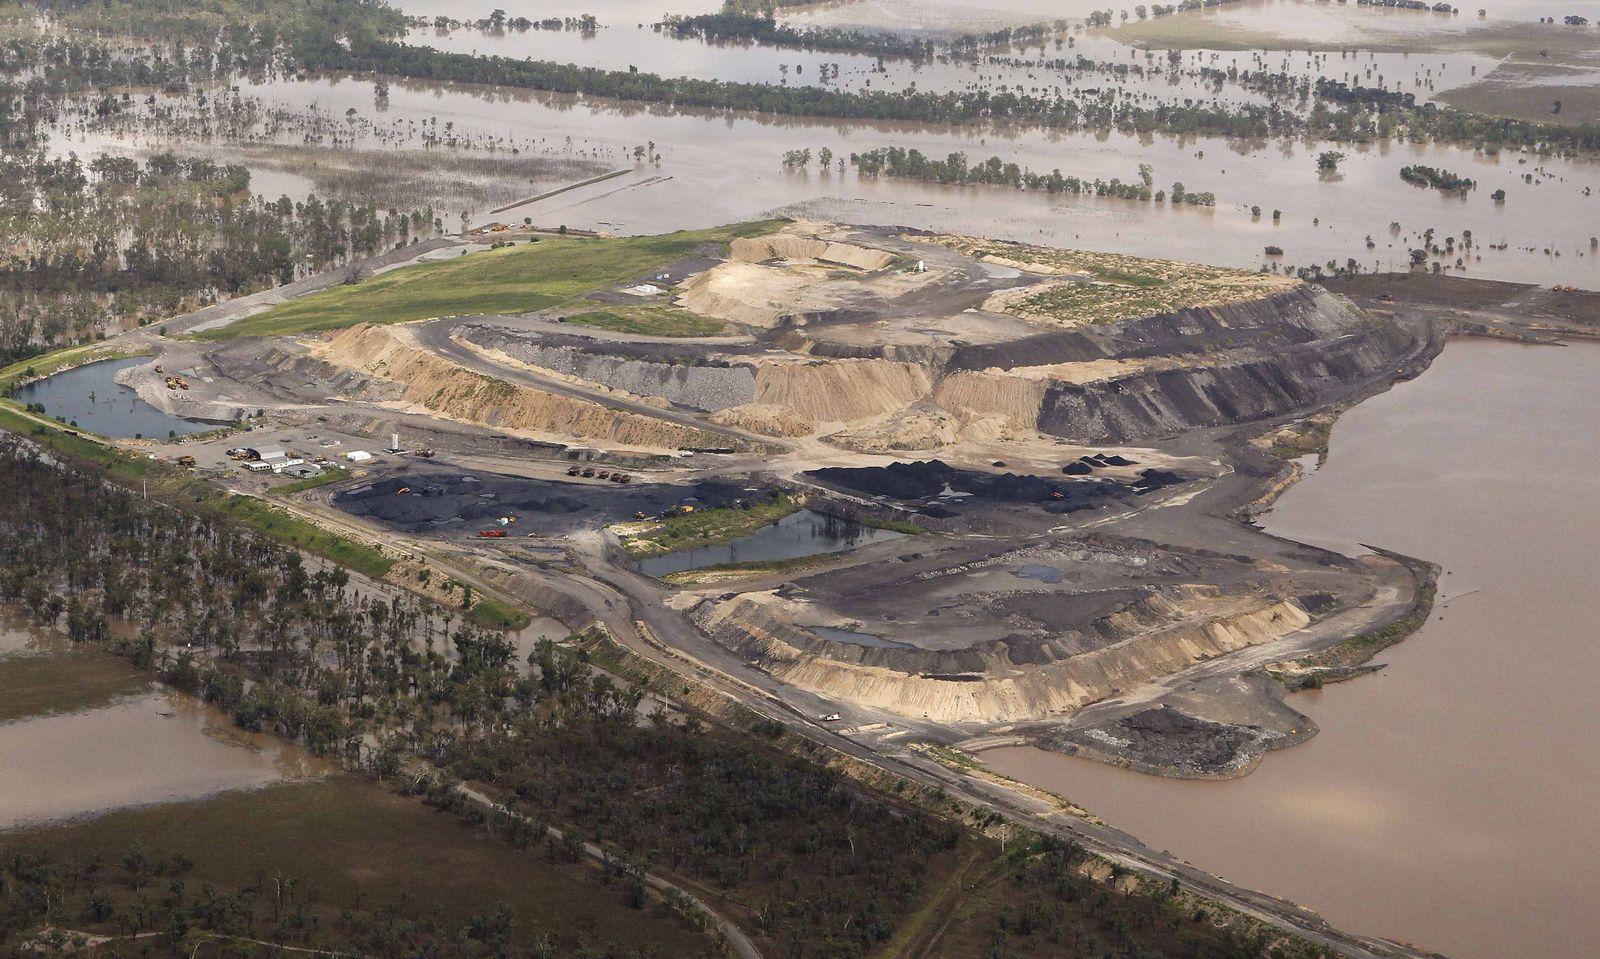 Kohlemine Queensland